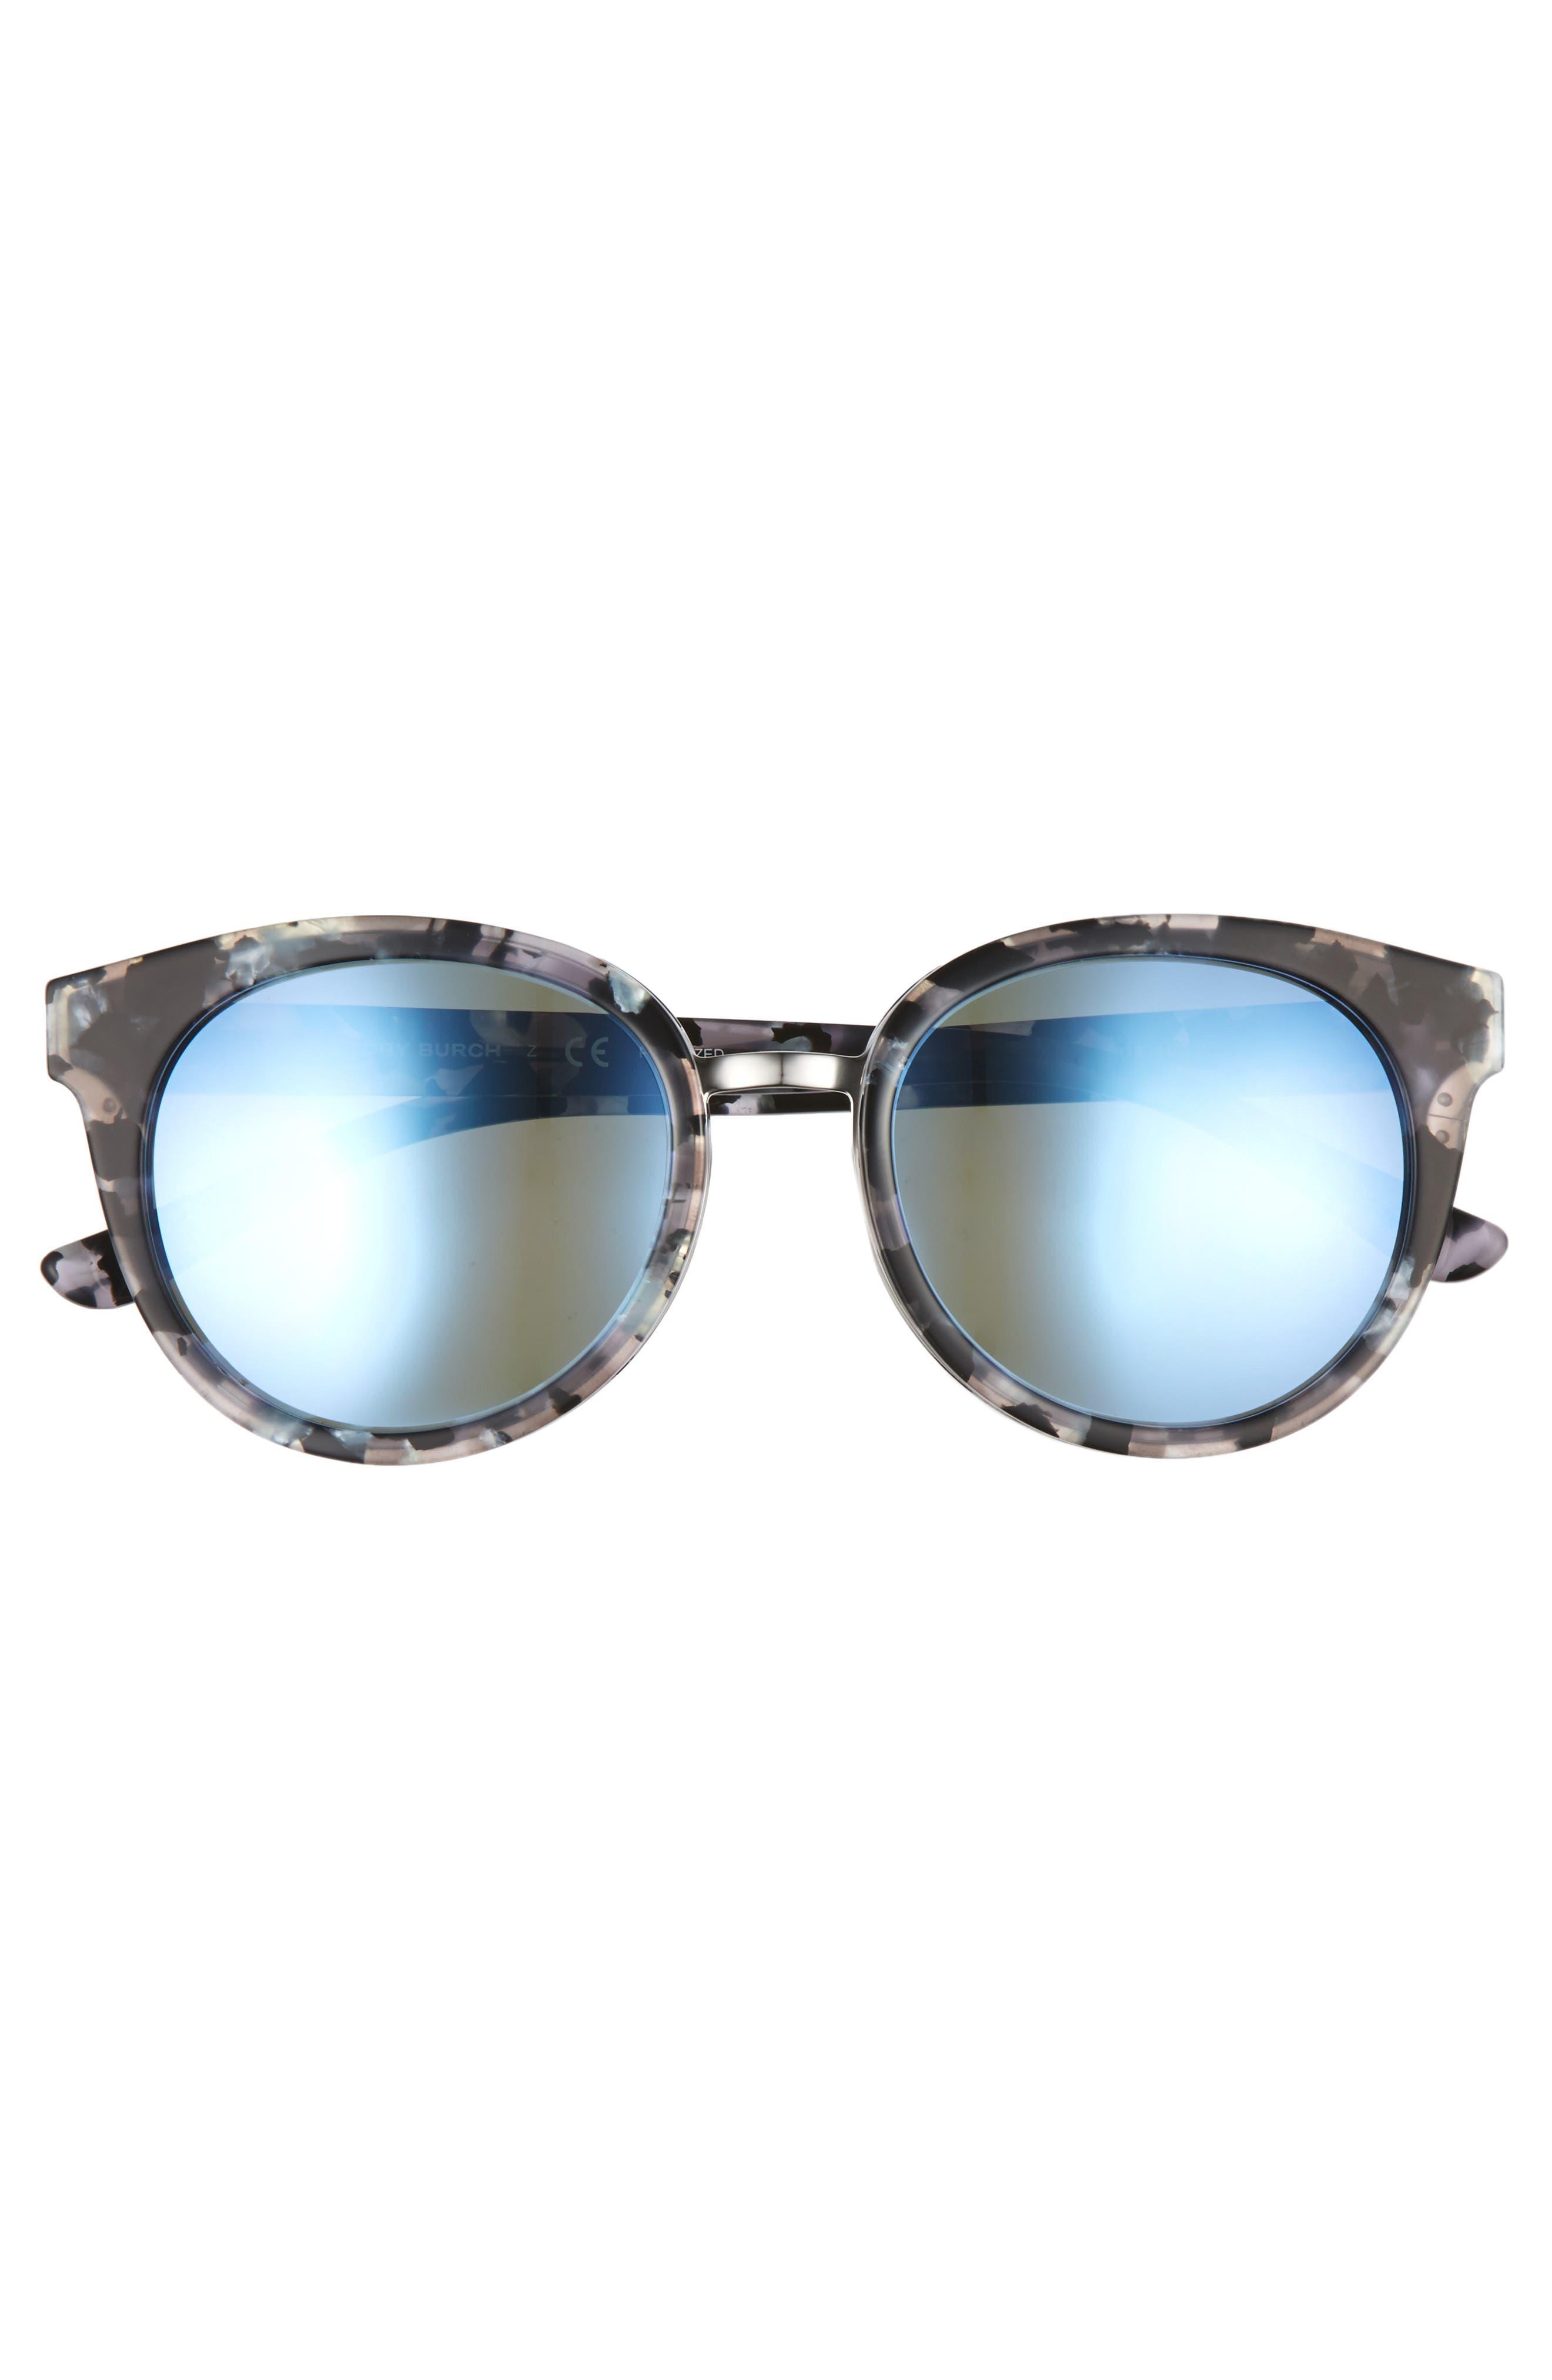 53mm Polarized Sunglasses,                             Alternate thumbnail 3, color,                             001